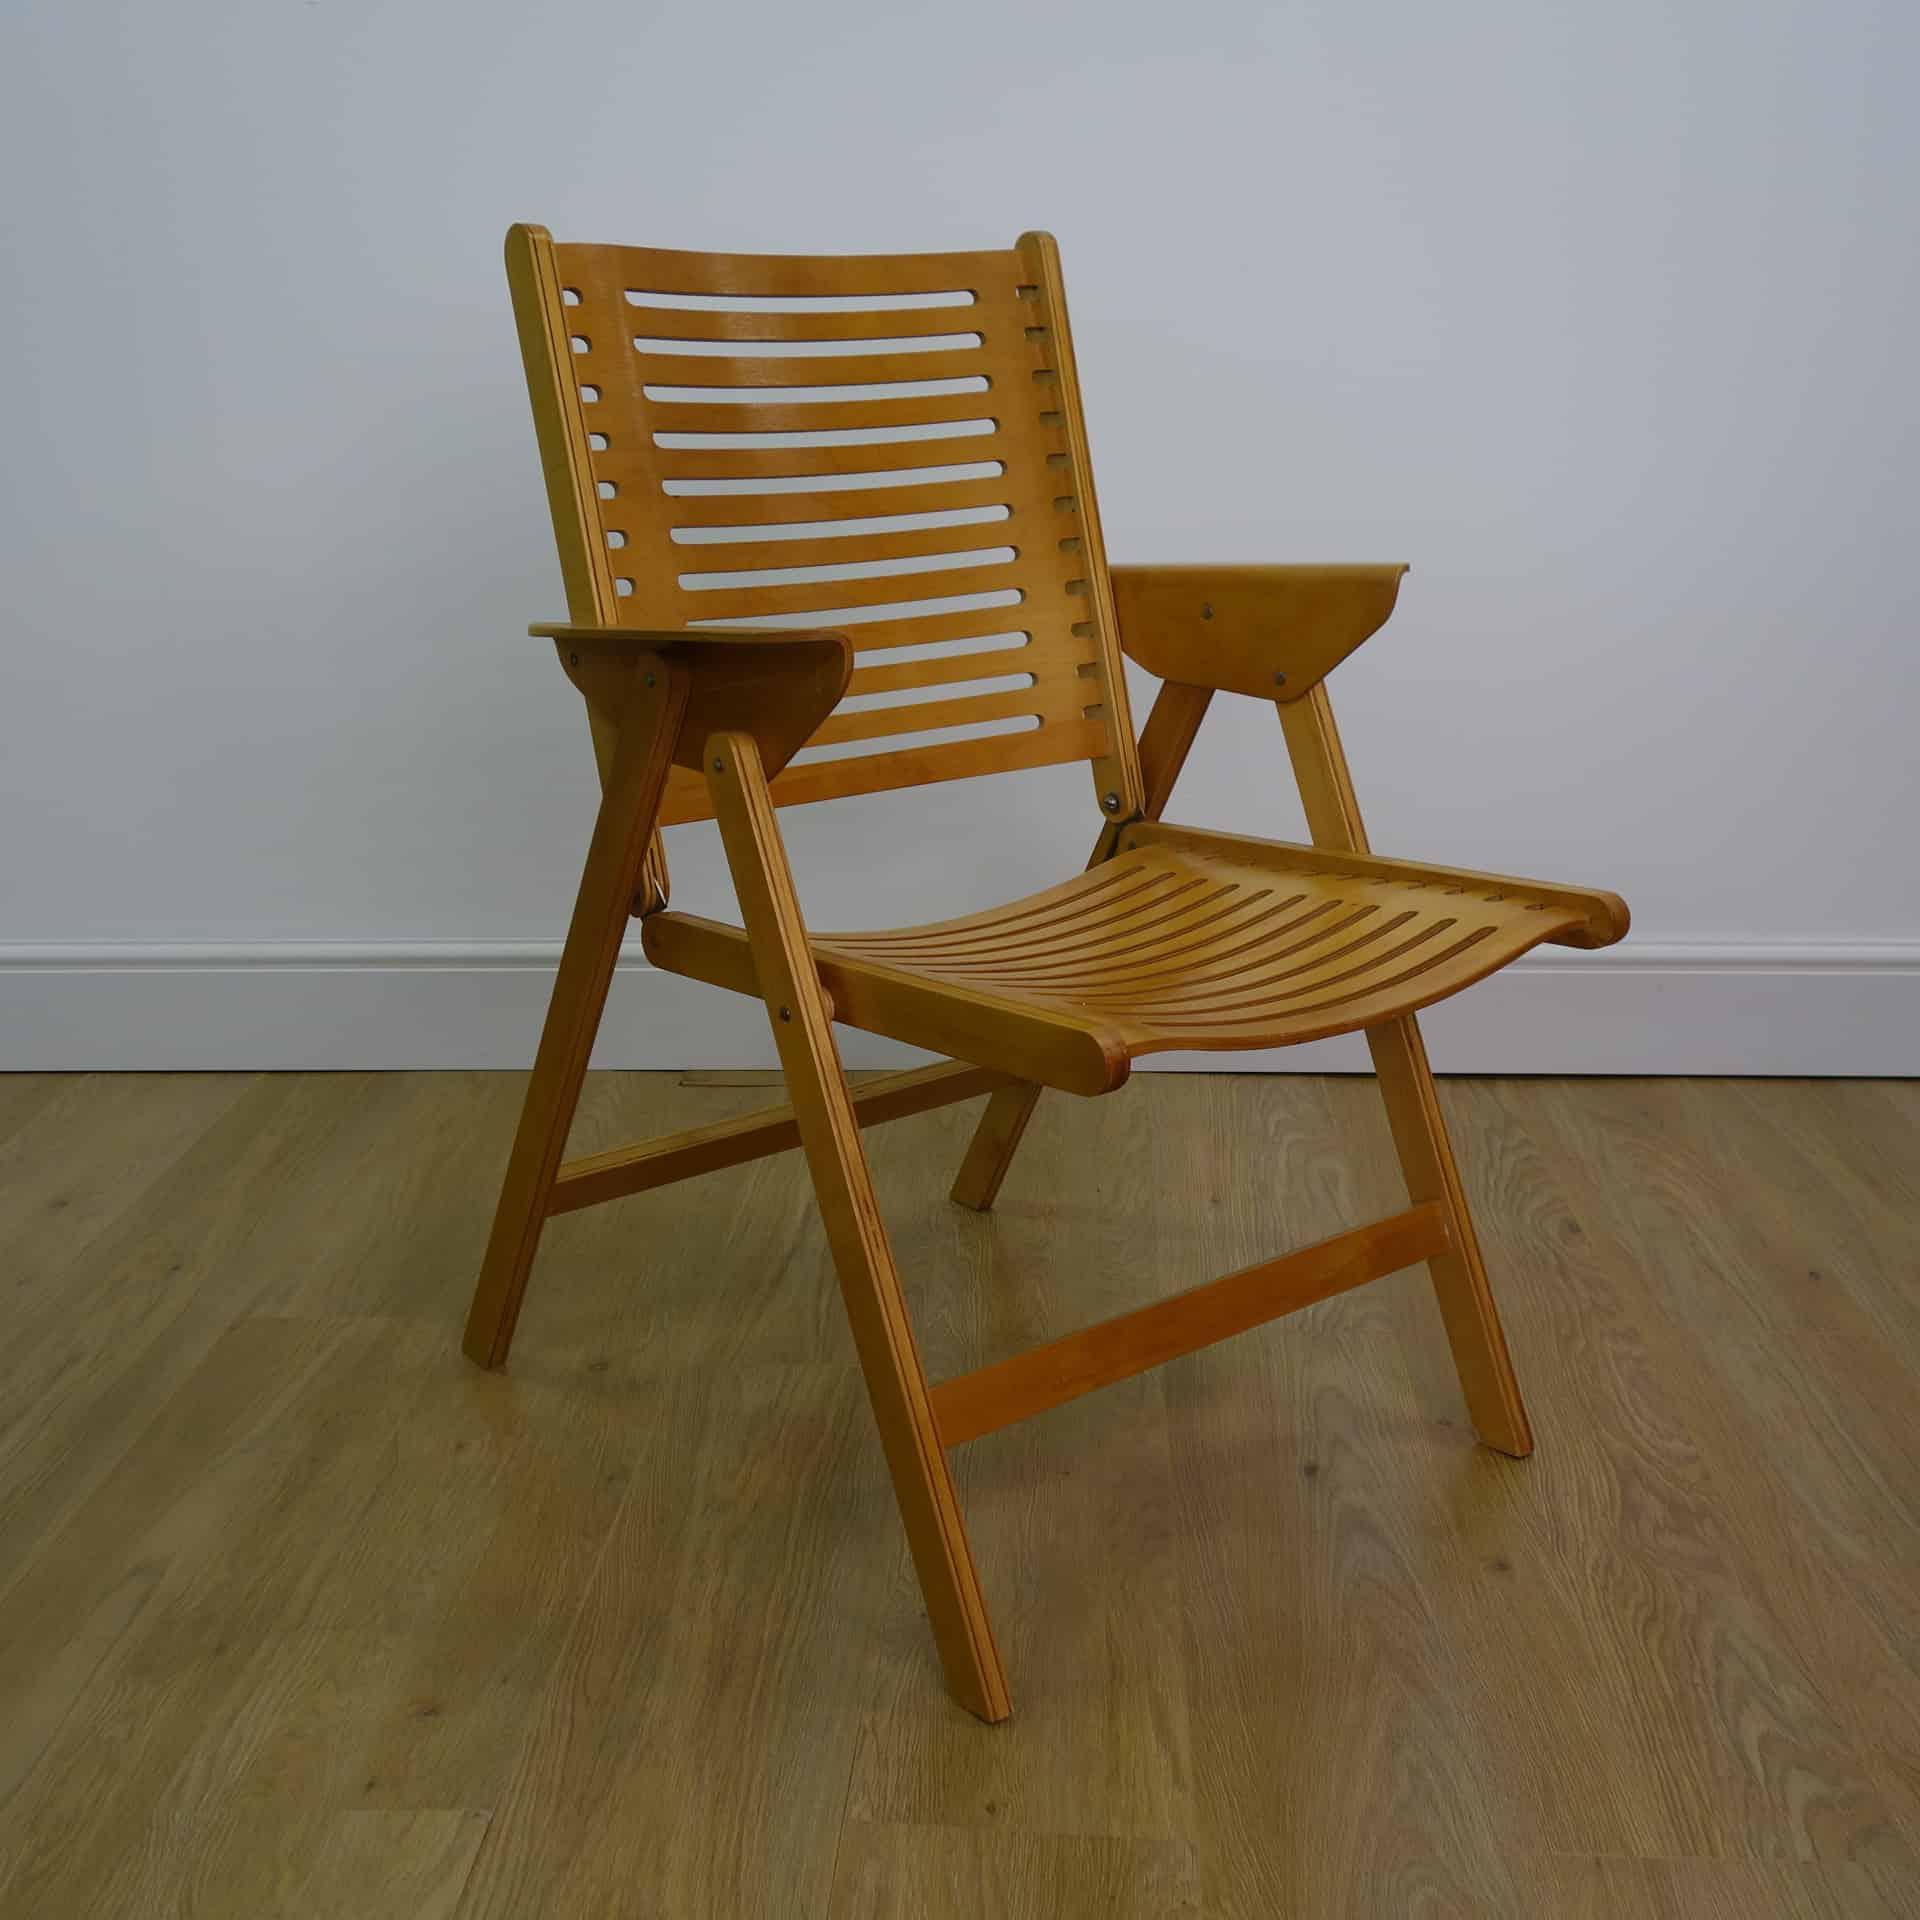 Rex plywood folding chairs designed by Niko Kralj